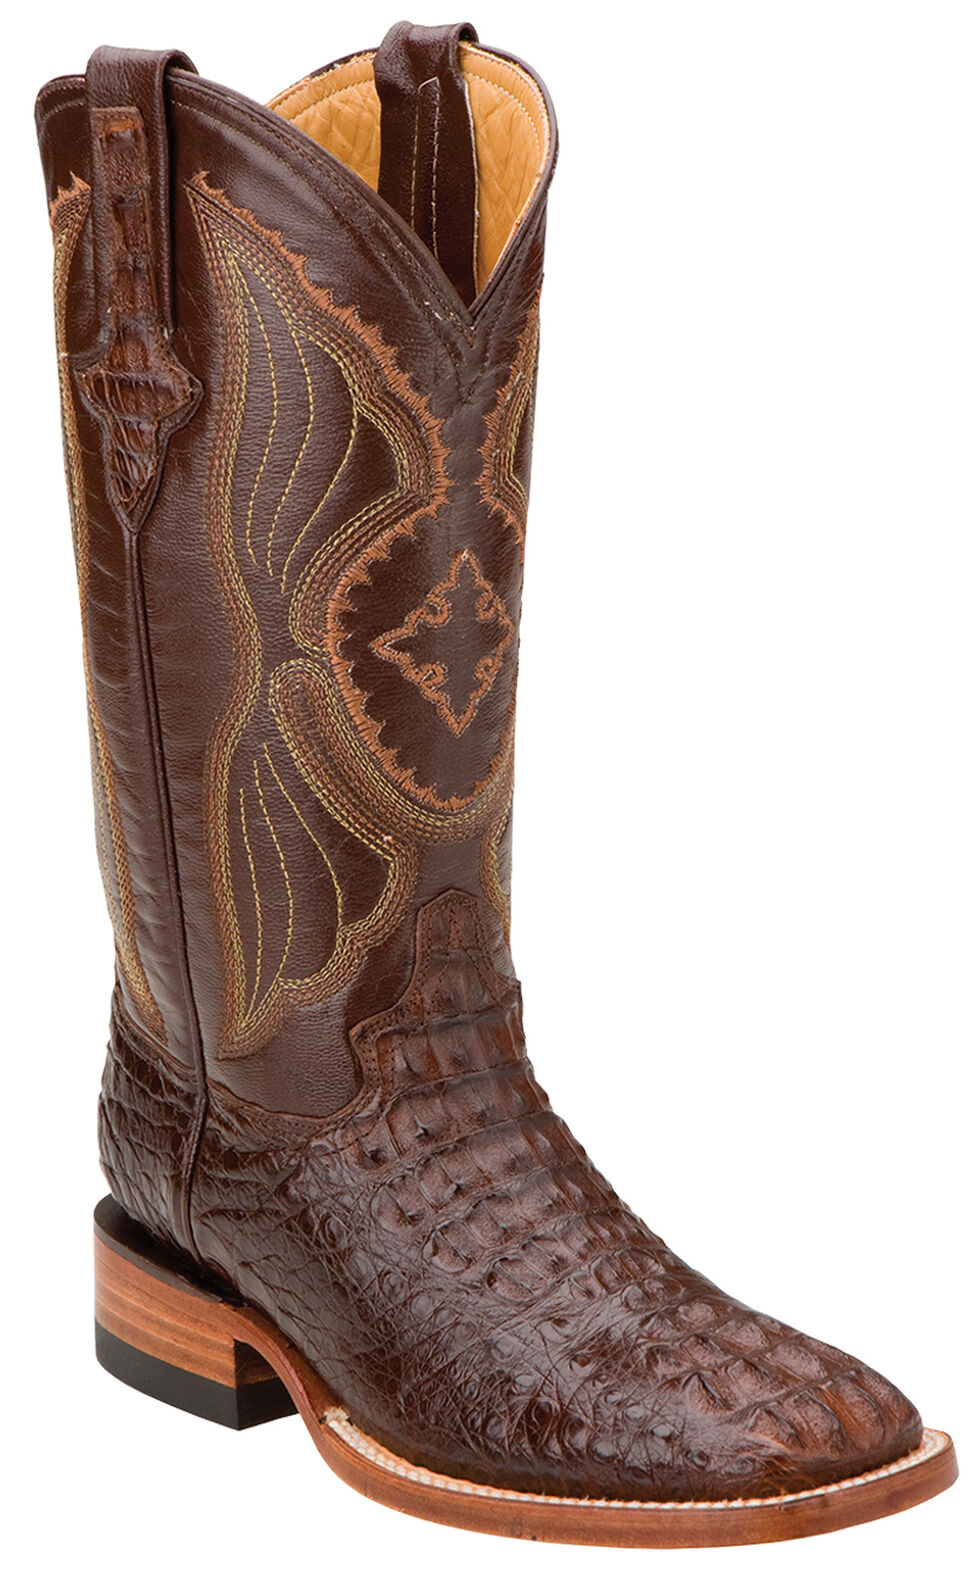 Ferrini Women's Hornback Caiman Cowgirl Boots - Square Toe, Rust, hi-res